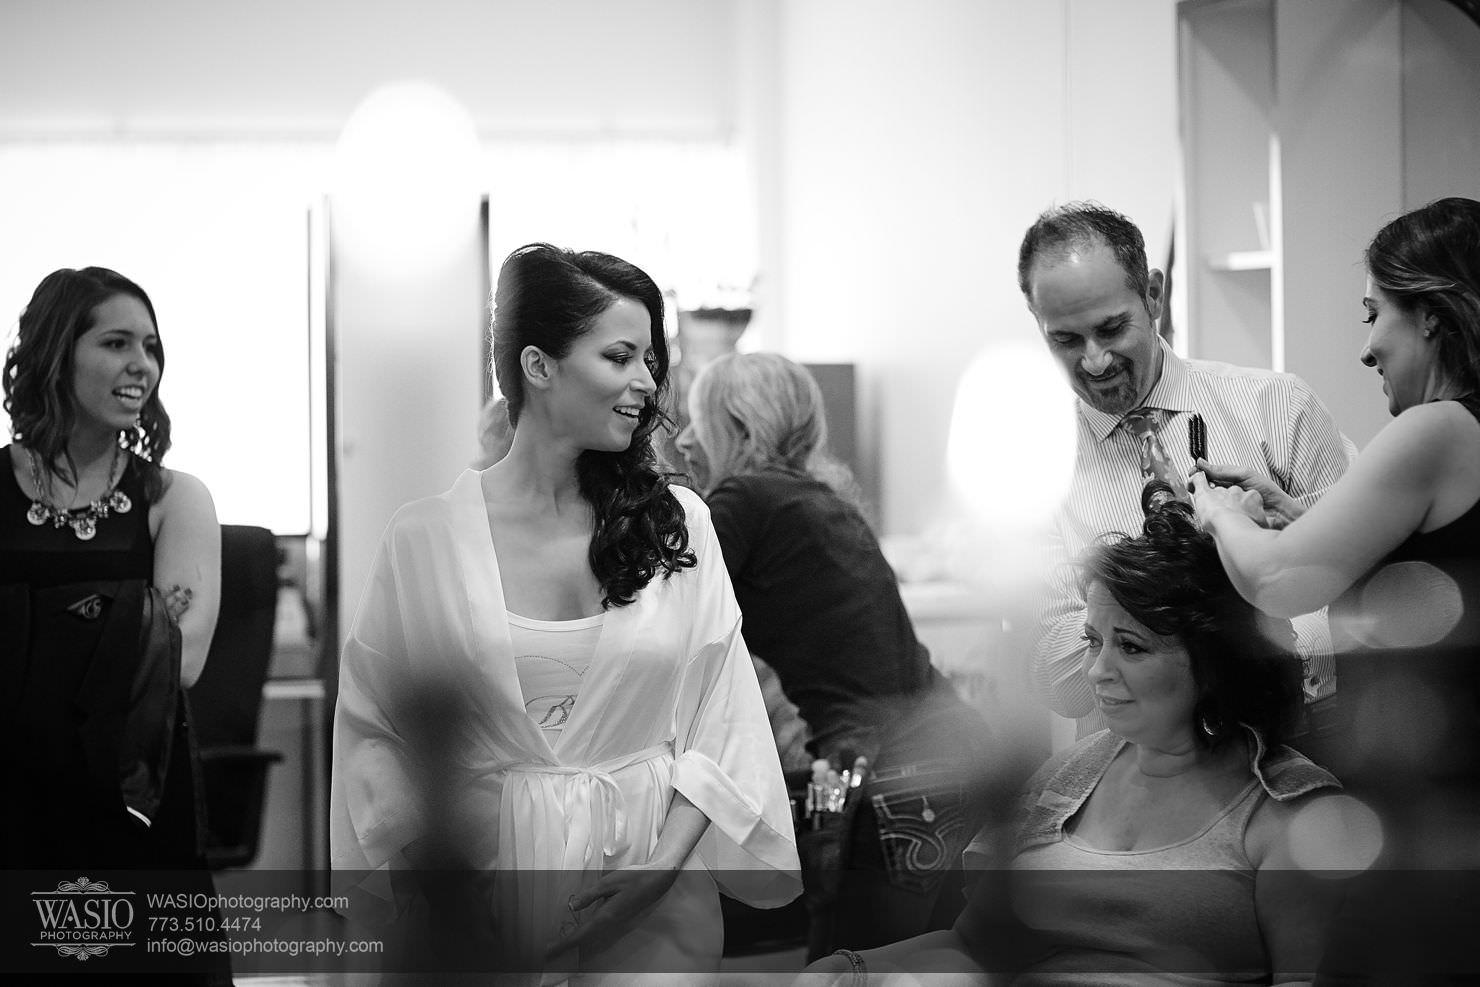 000_Chicago-Spring-Wedding_Chrissy-Andrew_3P4C5032 Chicago Spring Wedding - Chrissy + Andrew